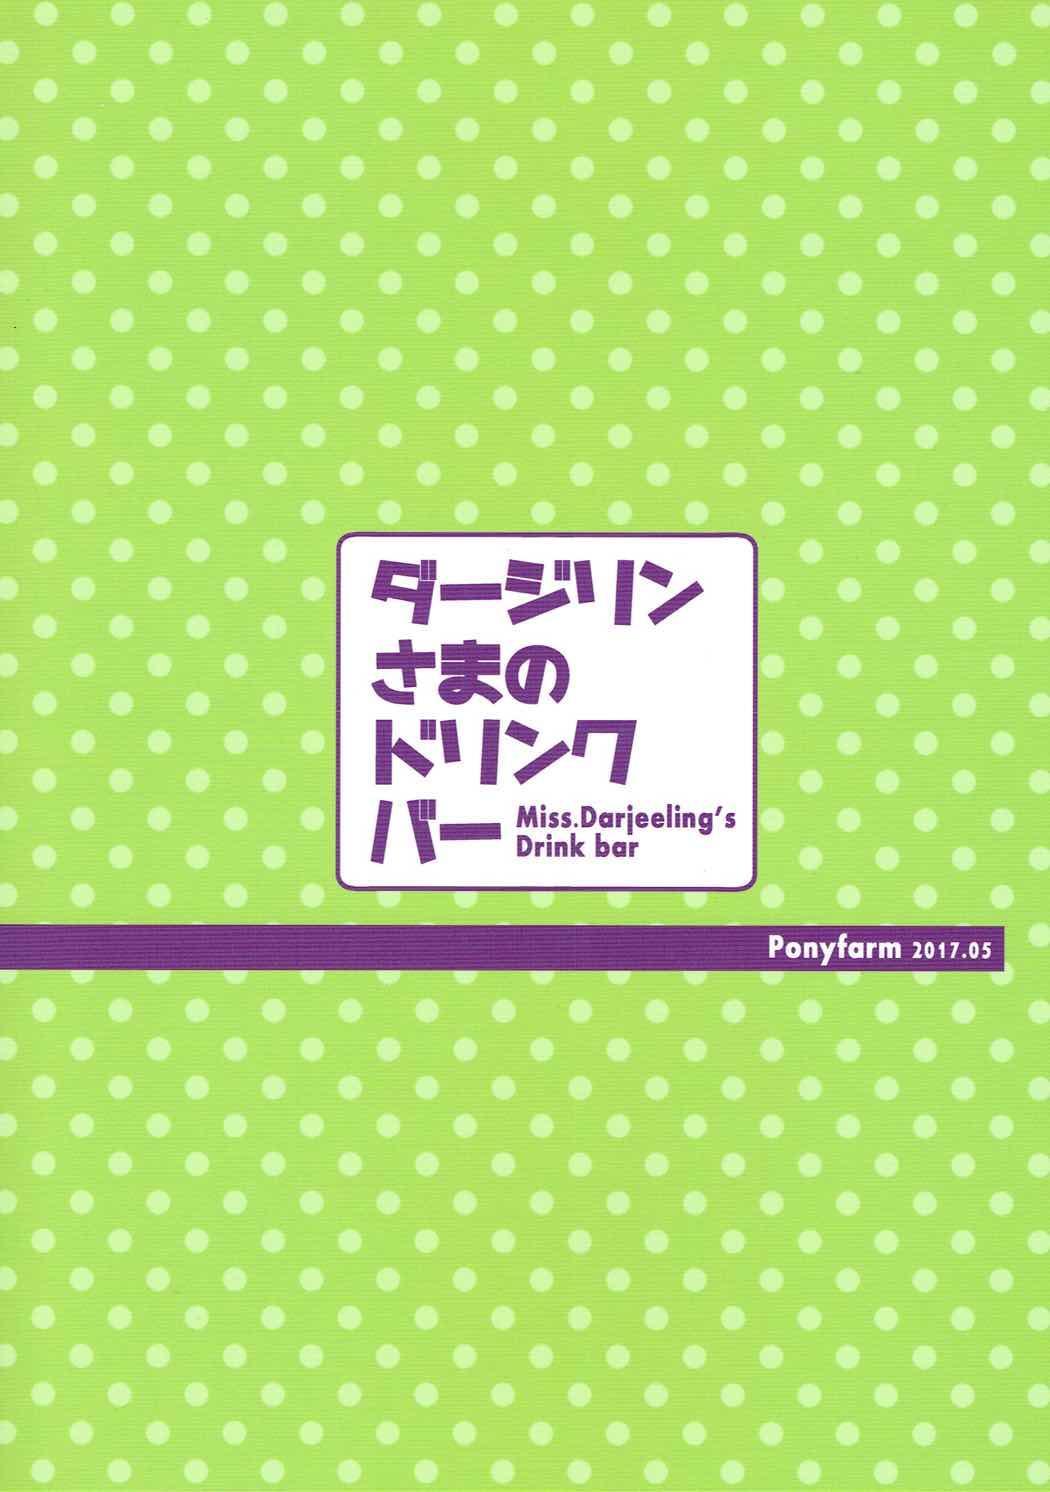 (COMIC1☆11) [Ponyfarm (Inoue Yoshihisa)] Darjeeling-sama no Drink Bar | Darjeeling-sama's Drink Bar (Girls und Panzer) [English] [CrowKarasu] 21